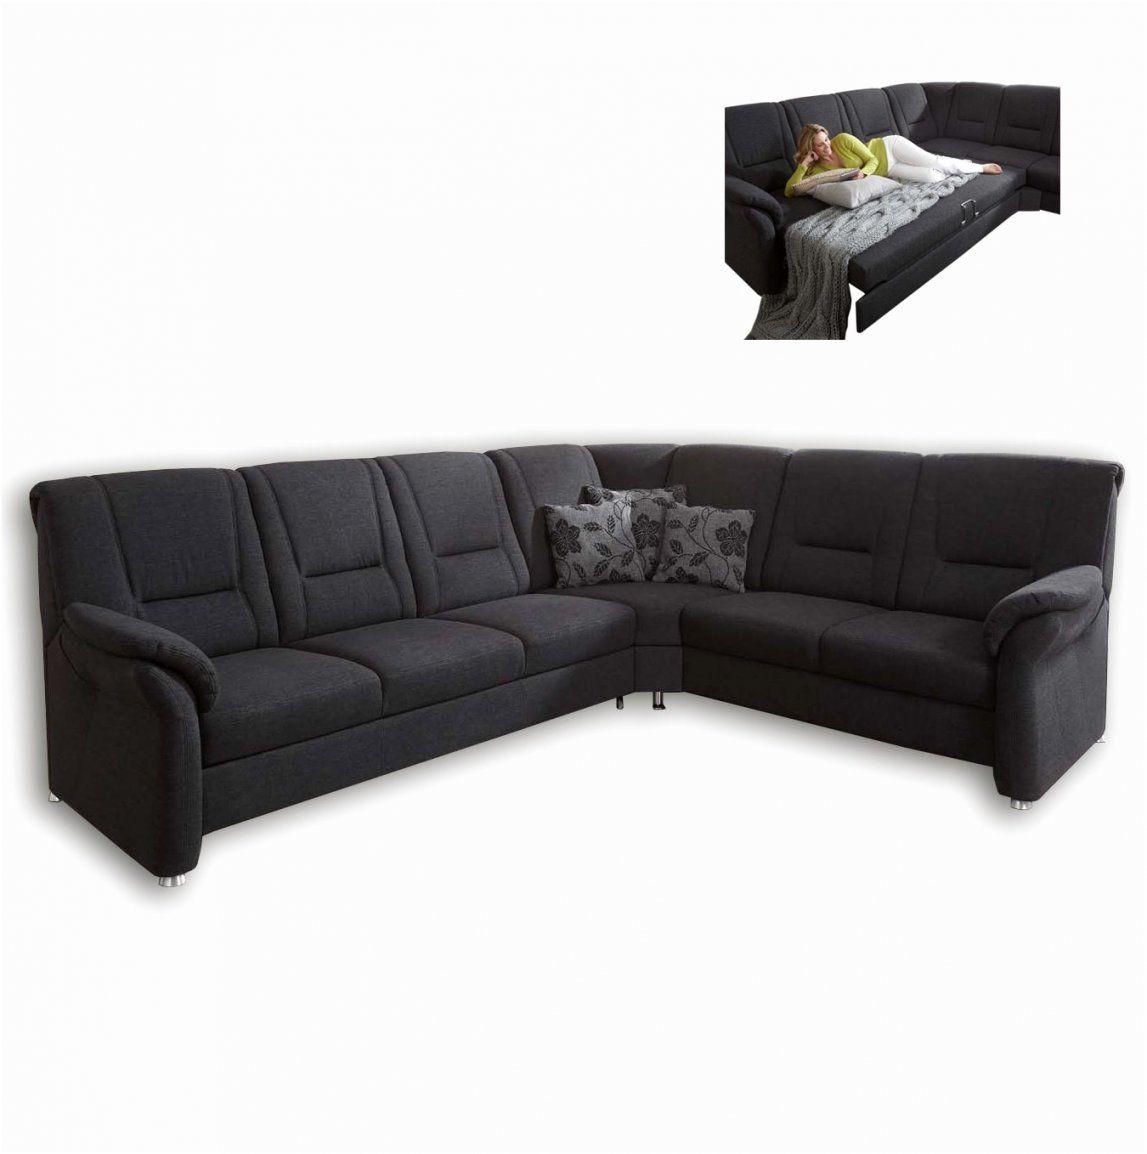 roller ecksofa mit schlaffunktion haus design ideen. Black Bedroom Furniture Sets. Home Design Ideas